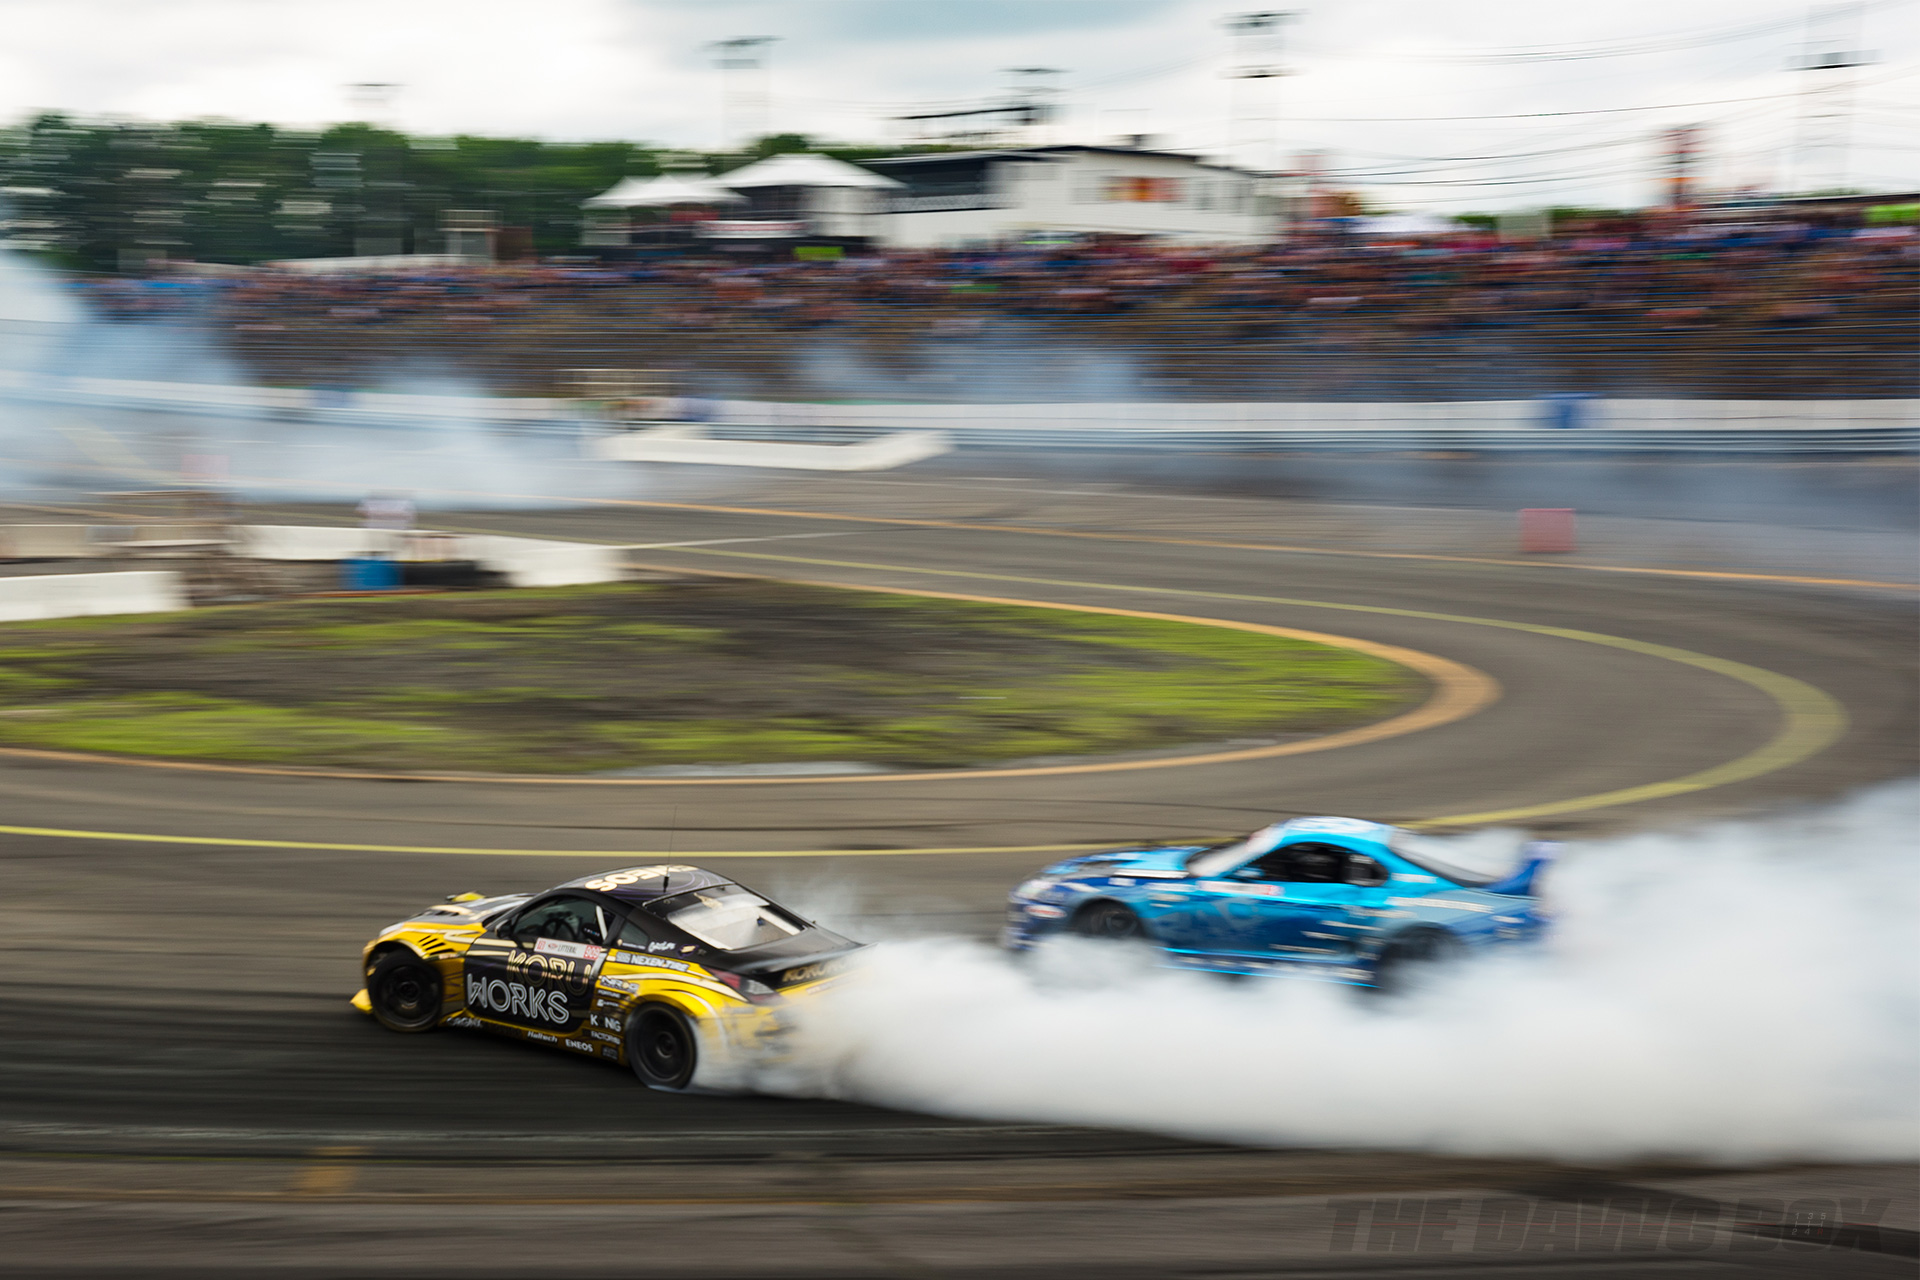 Nissan 350Z and Toyota Supra tandem drifting